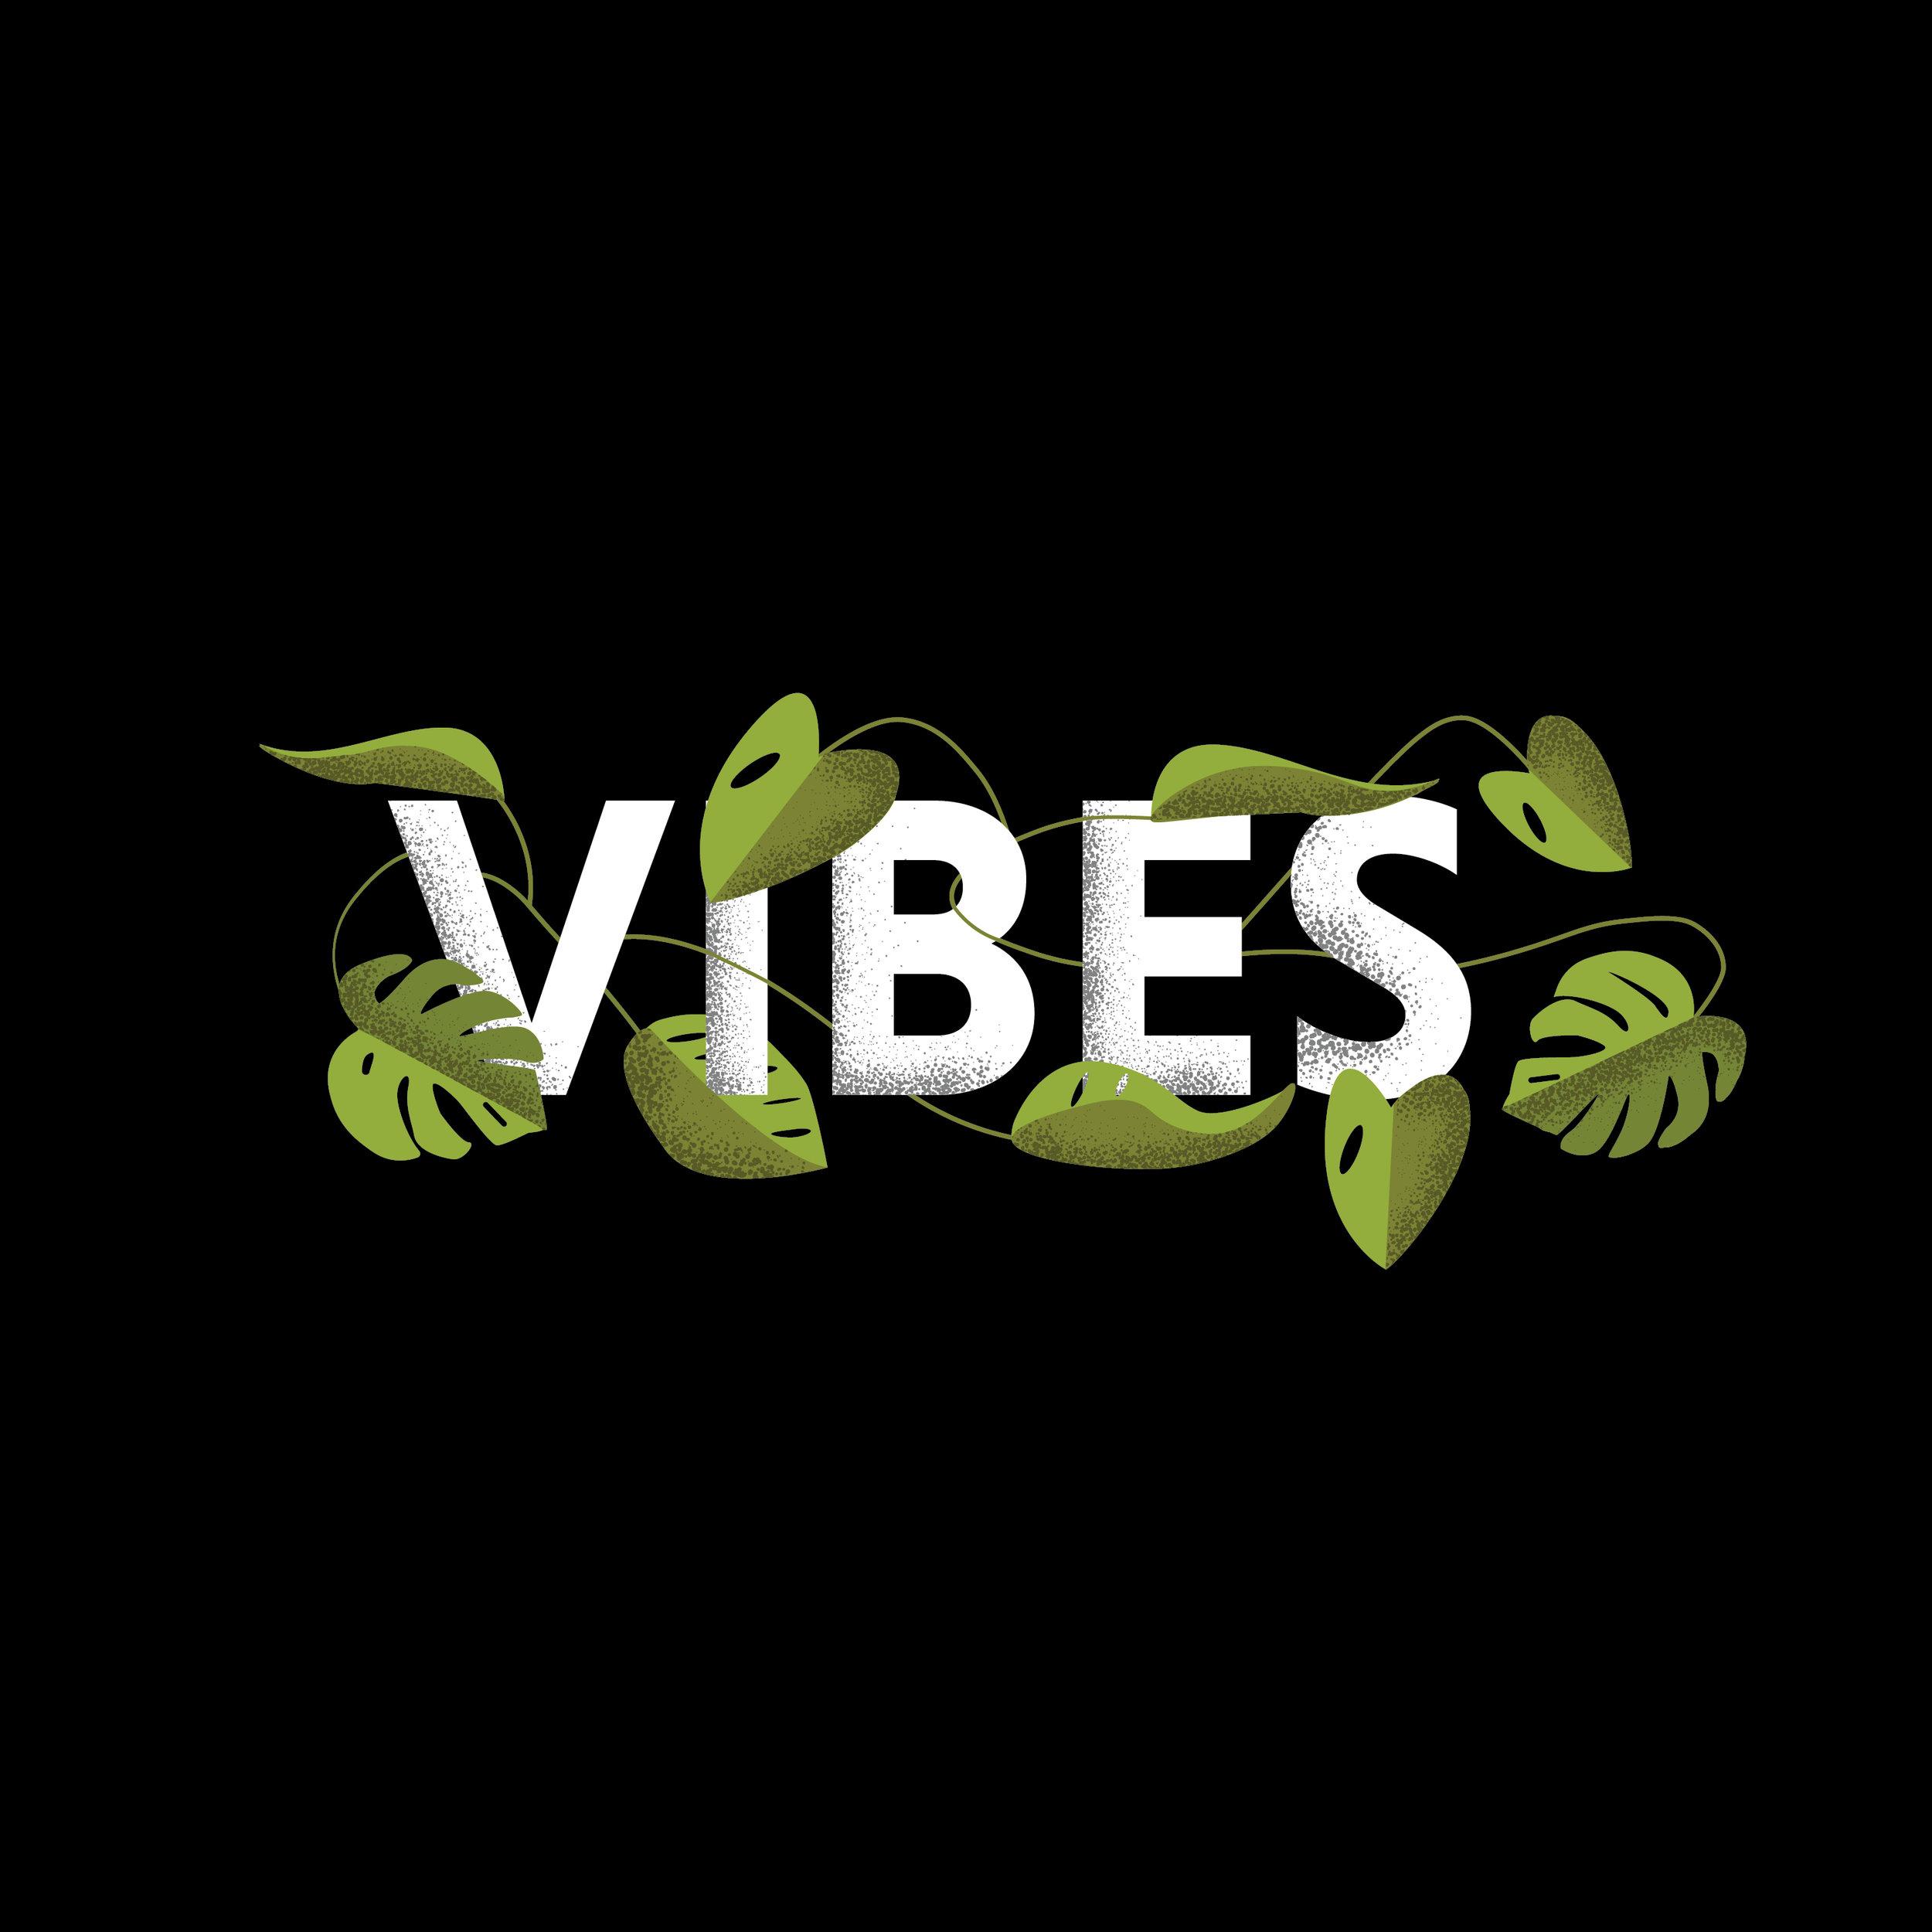 vibes-01.jpg